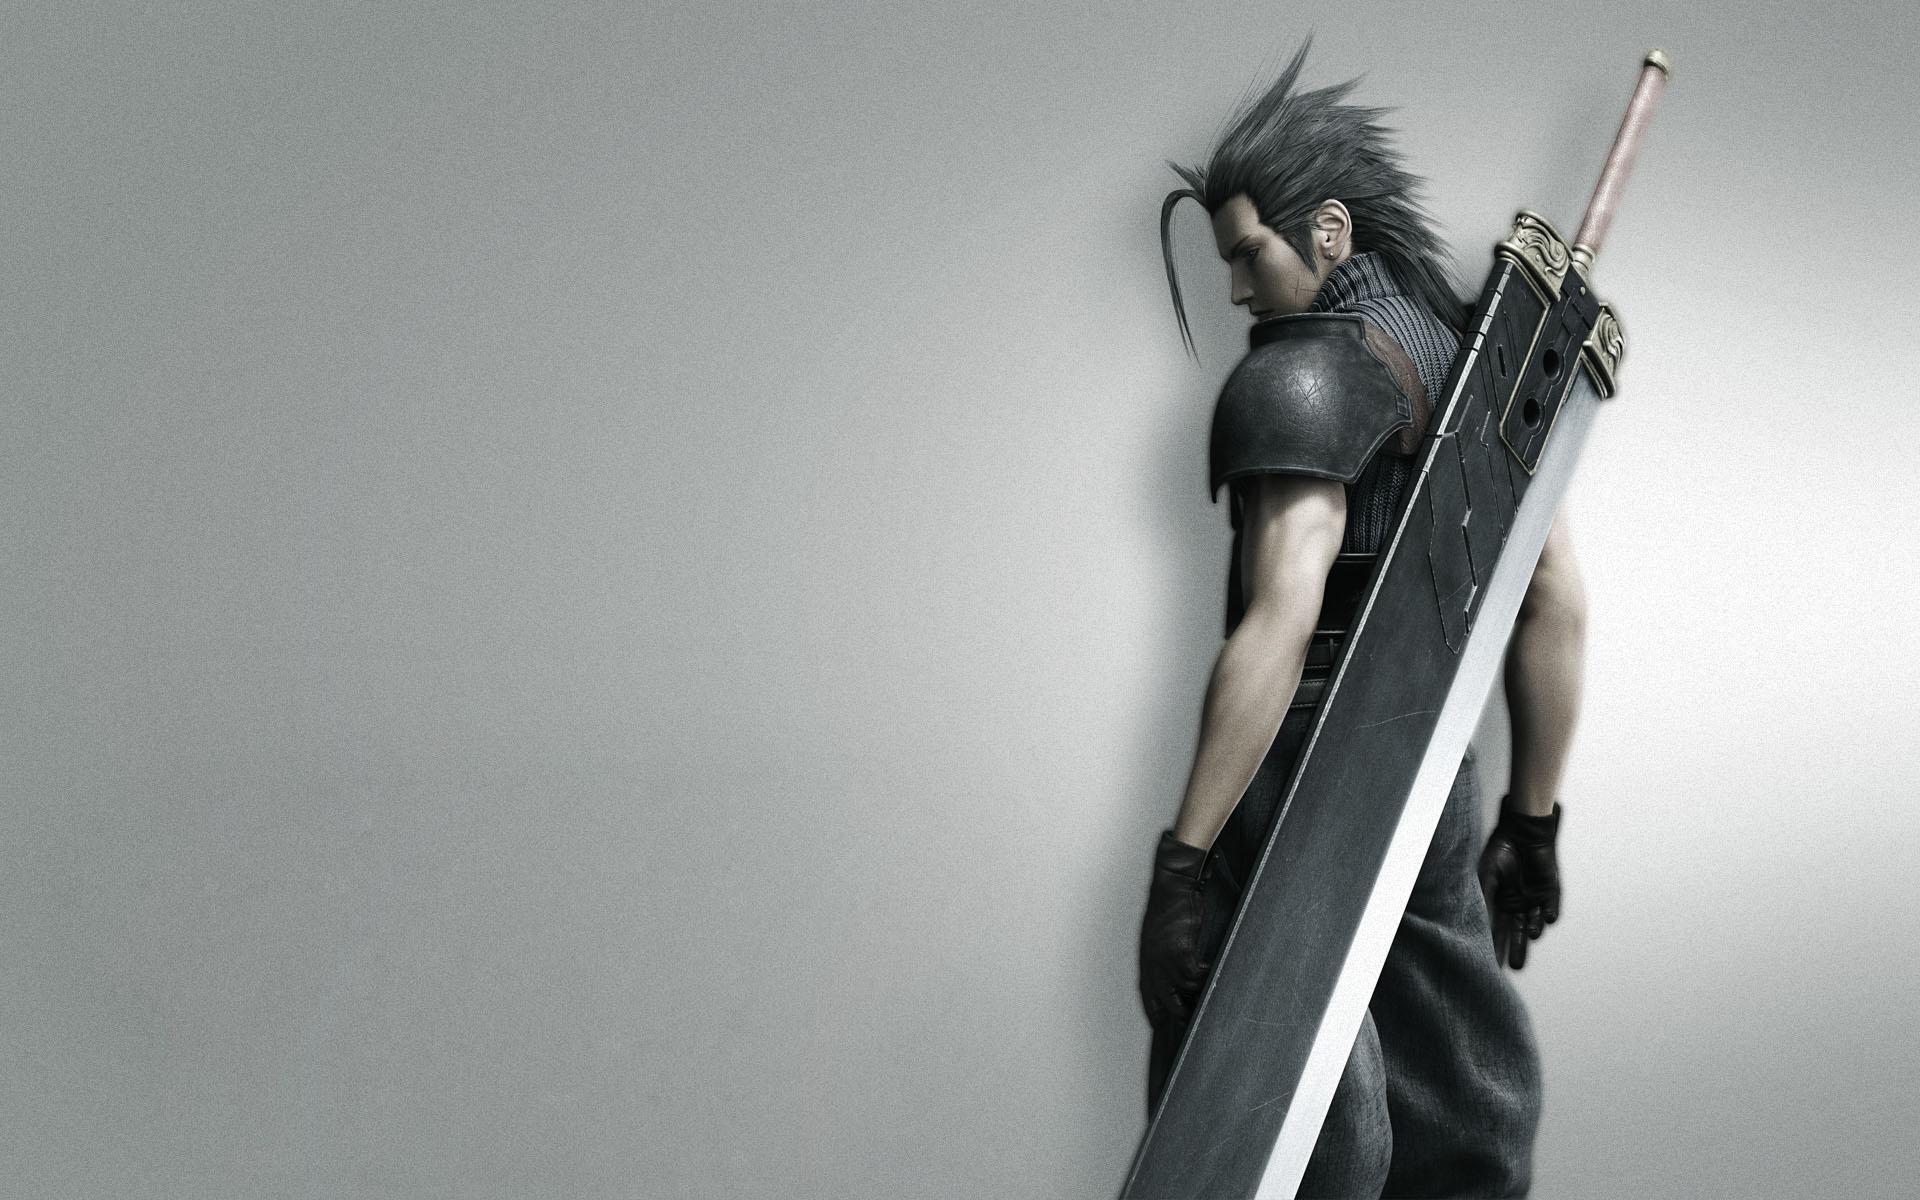 Final Fantasy Vii Crisis Core Hd Wallpaper